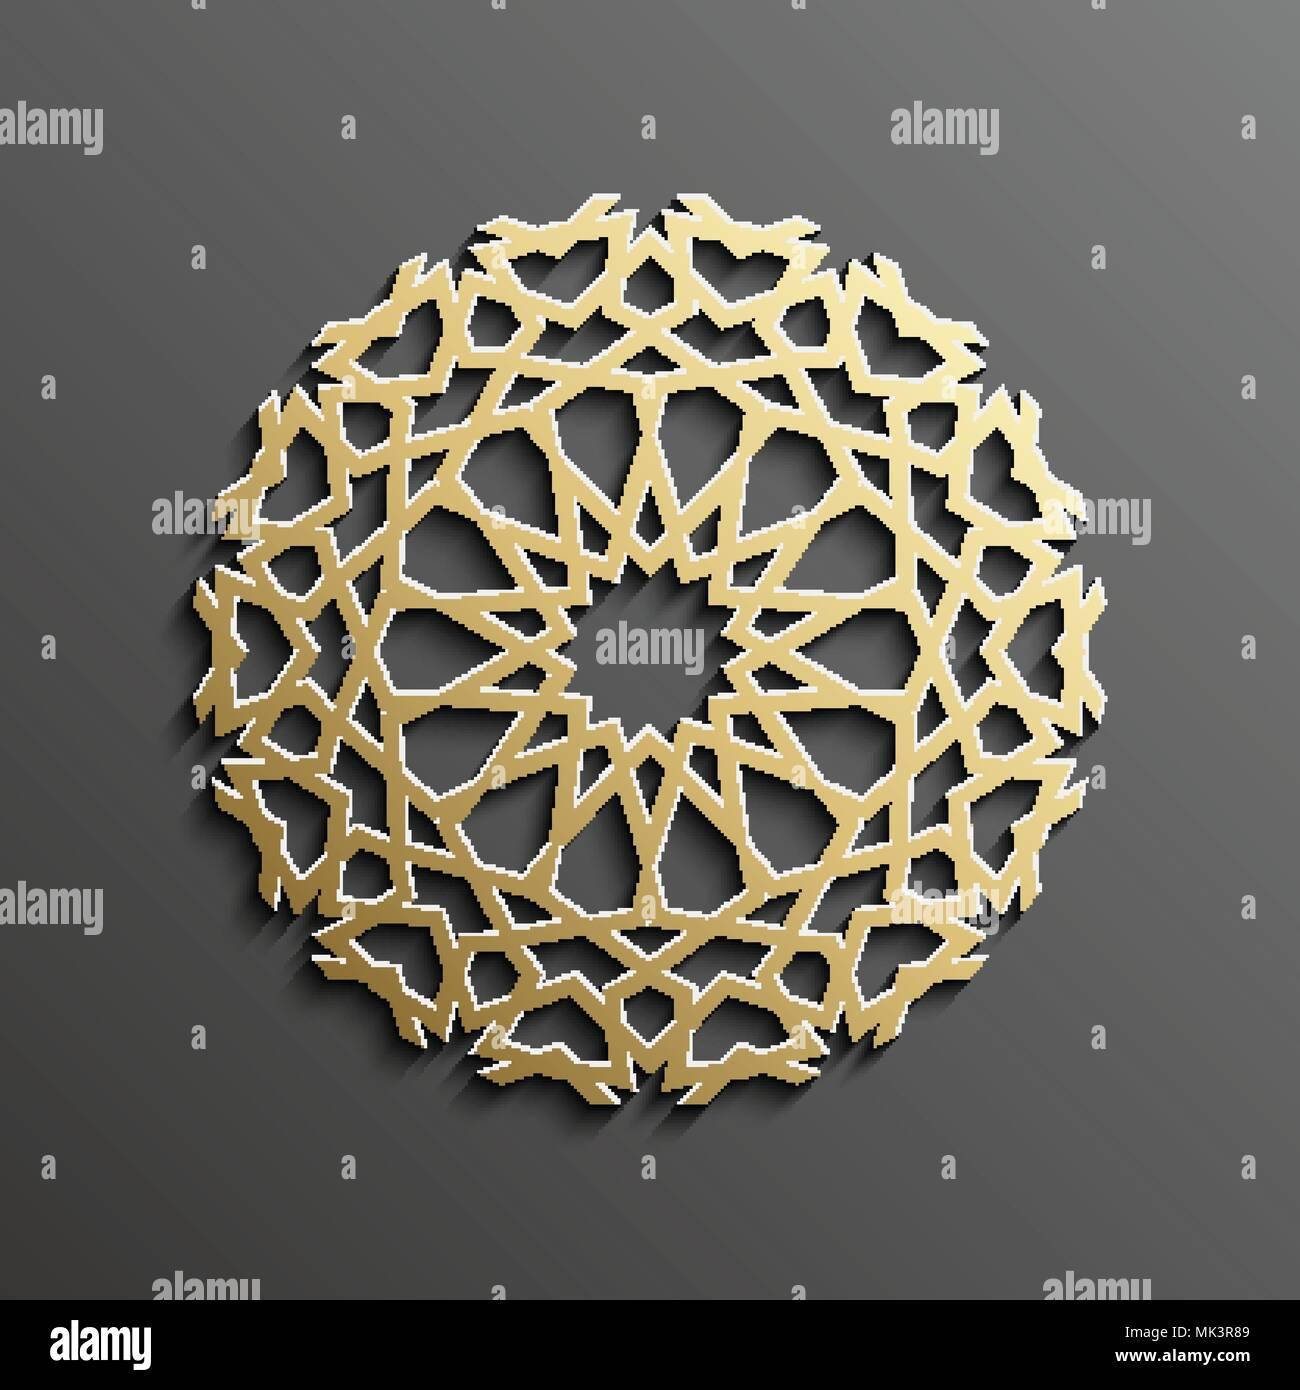 Islamic mandala 3d gold background on dark round ornament islamic mandala 3d gold background on dark round ornament architecture muslim texture brochures invitation persian motif design stopboris Gallery